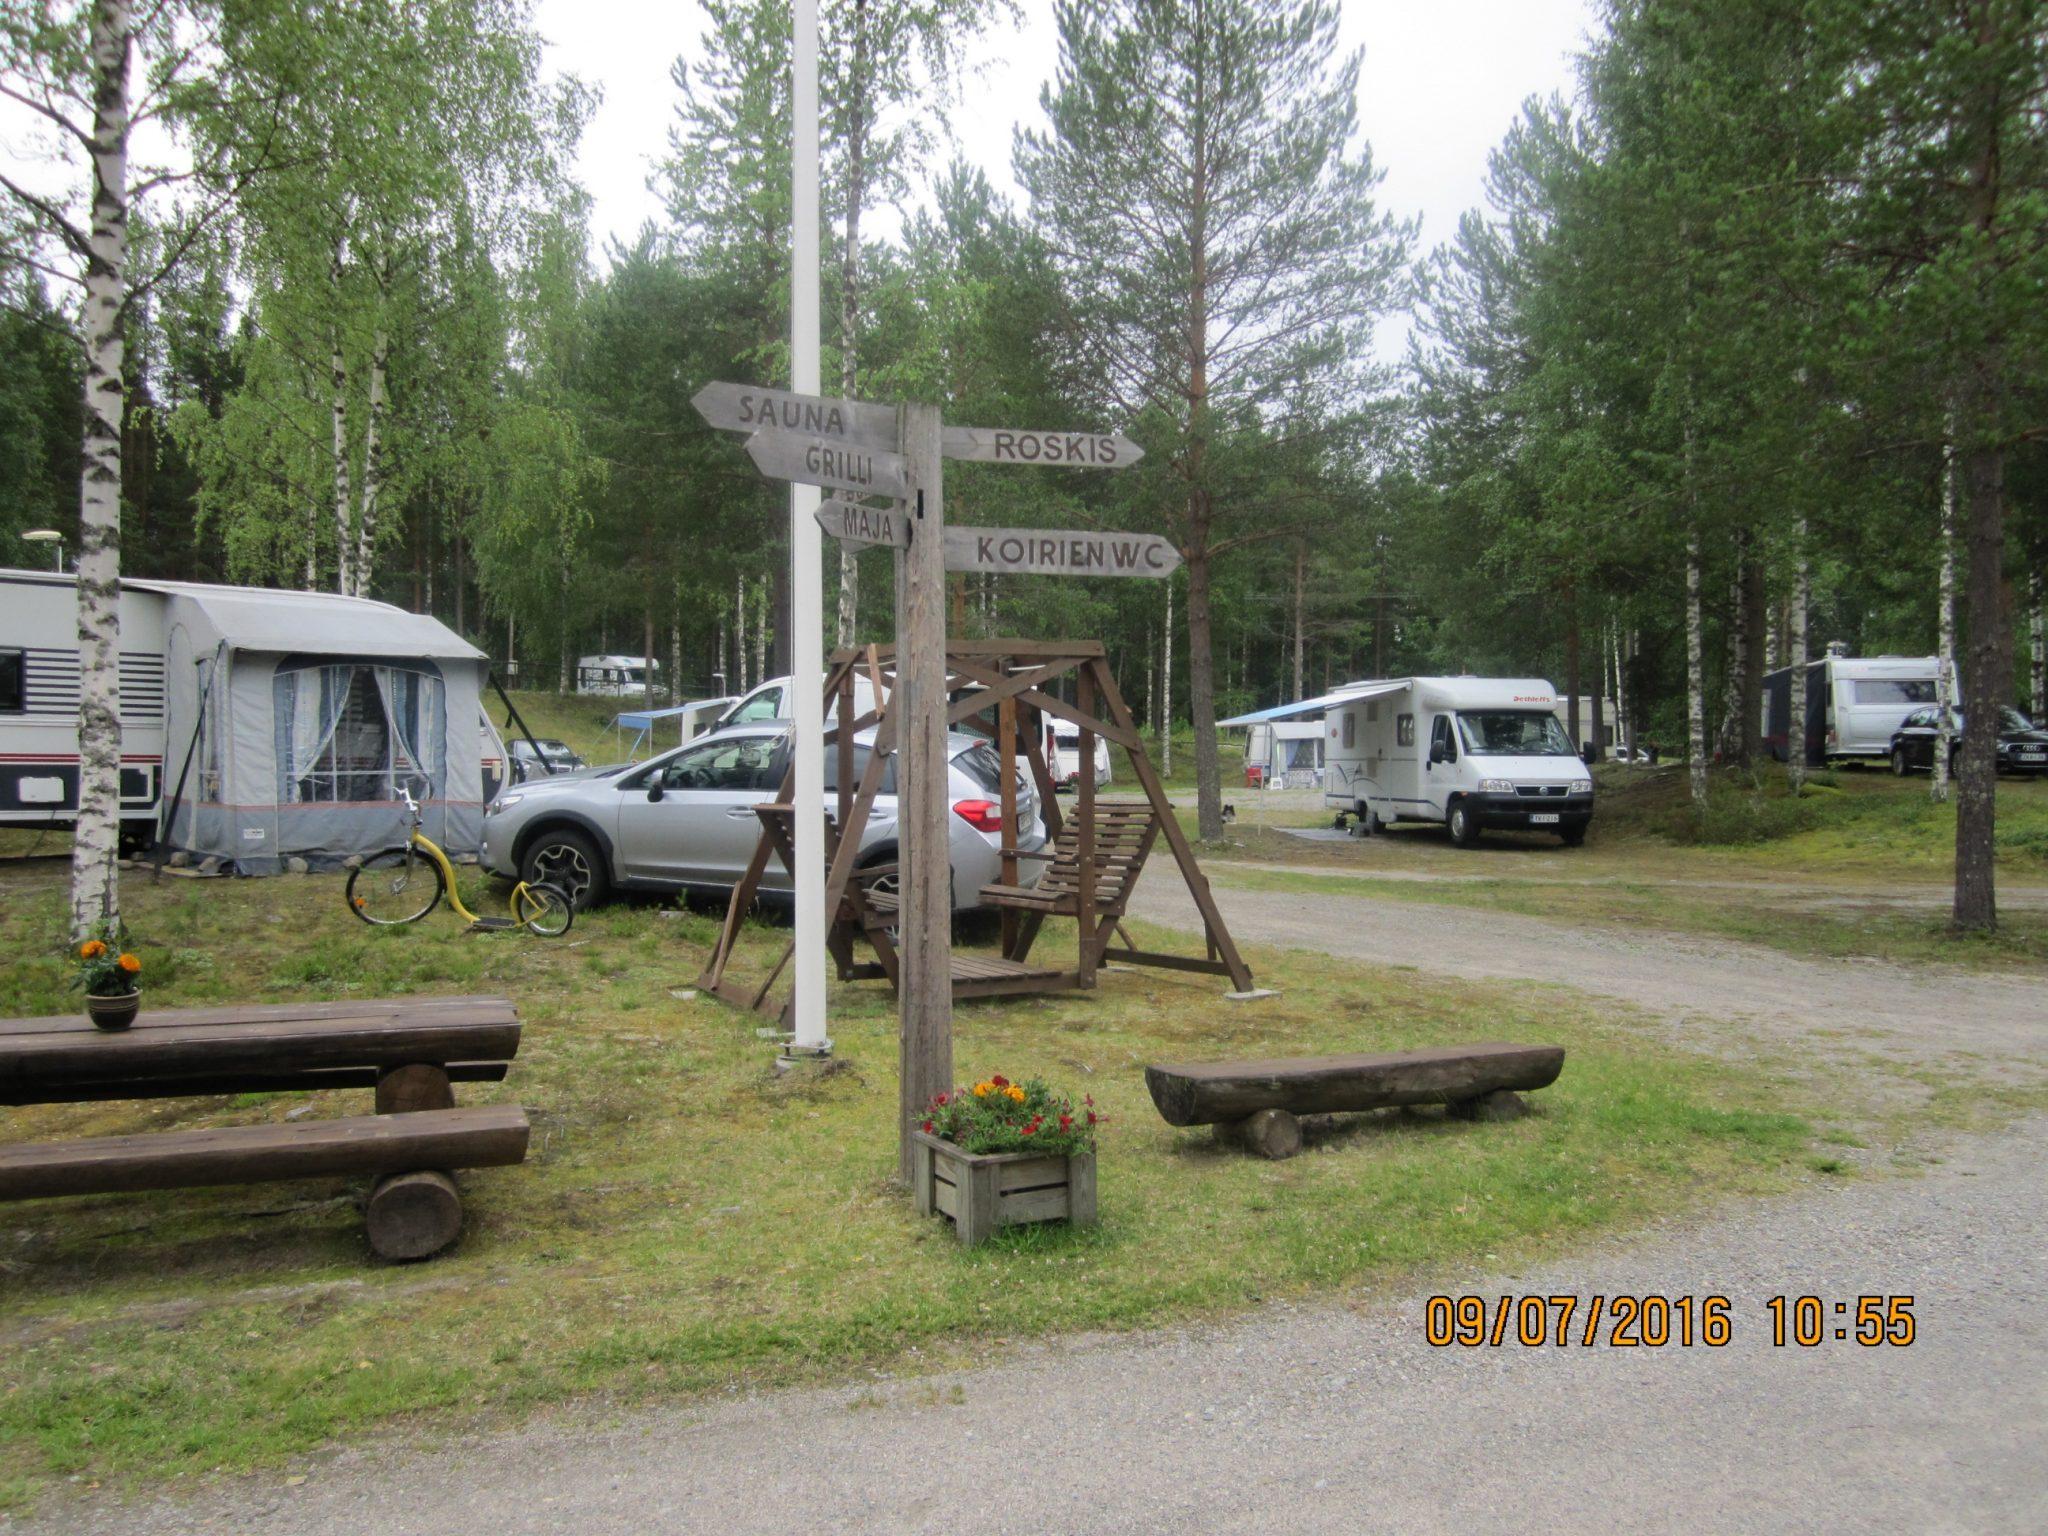 Guide sign in Rekiniemi